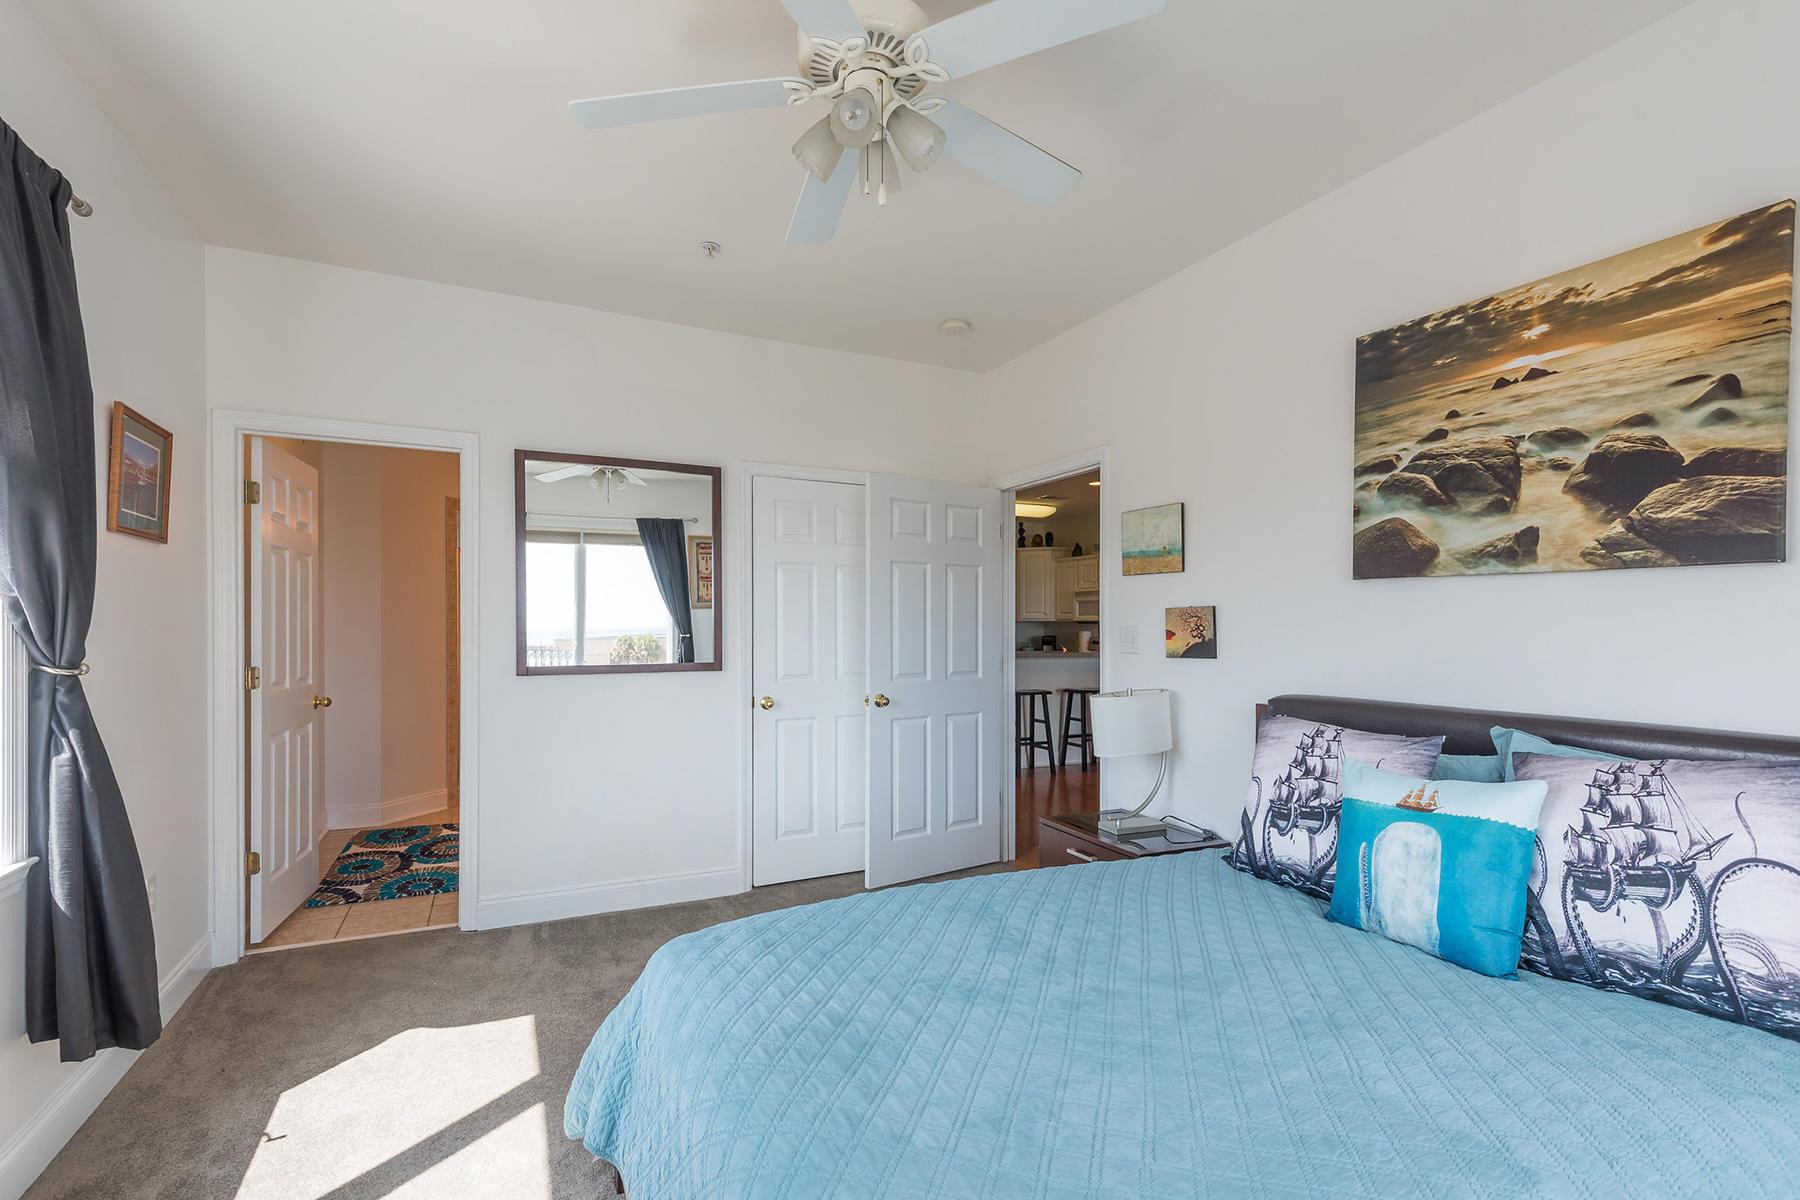 Pier Pointe Villas Homes For Sale - 114 Ashley, Folly Beach, SC - 22